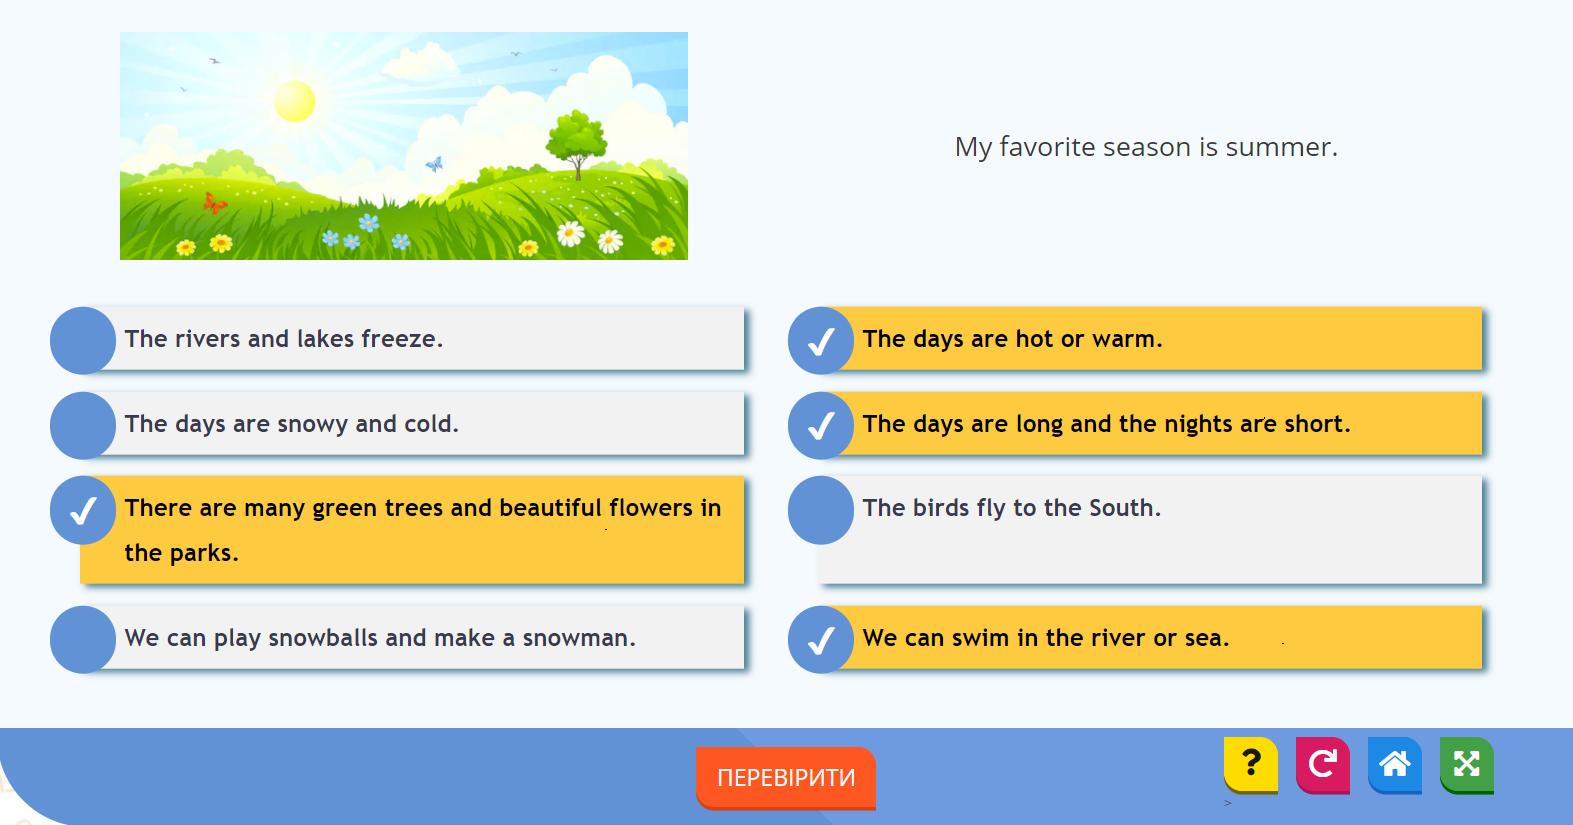 Seasons. SUMMER.